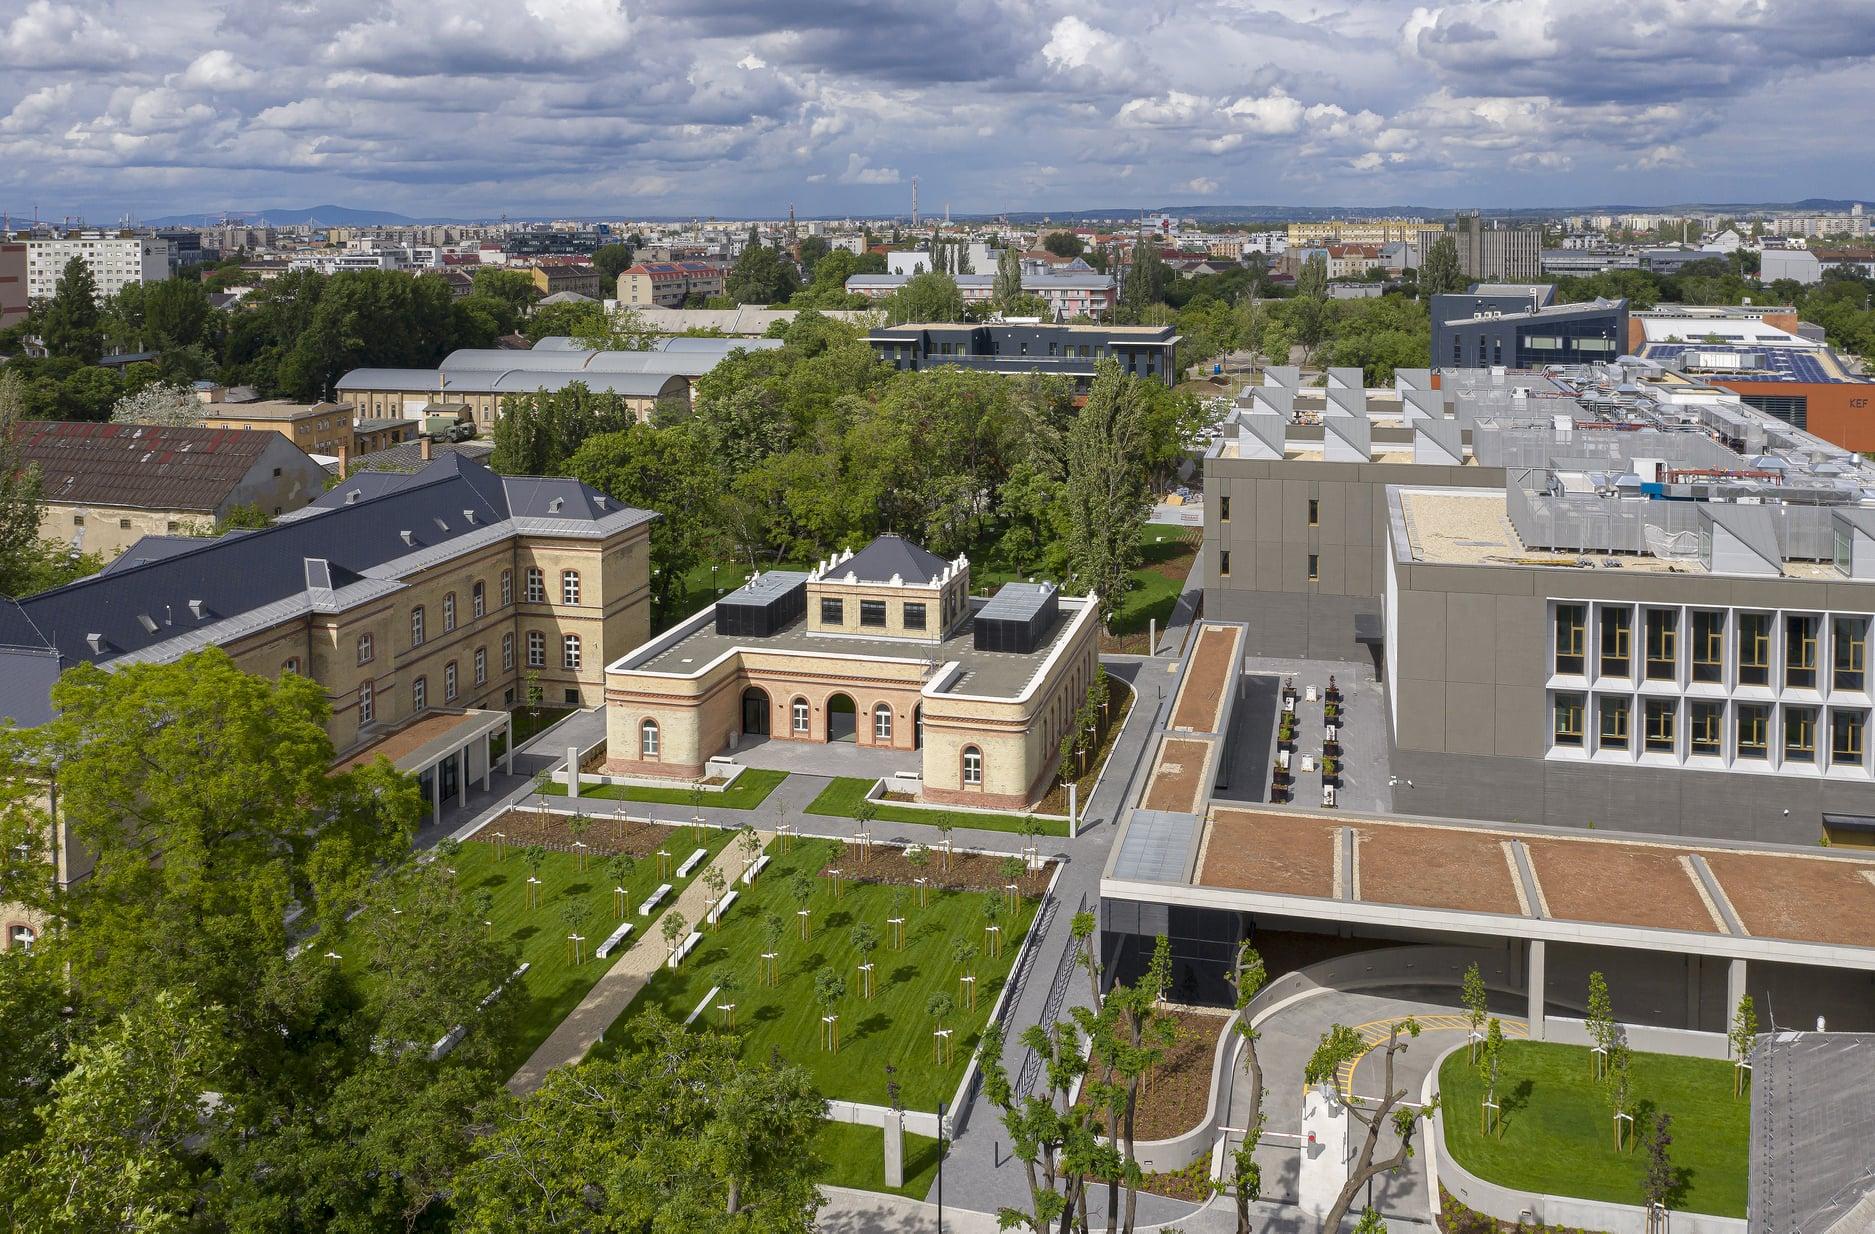 Liget Budapest architecture museum